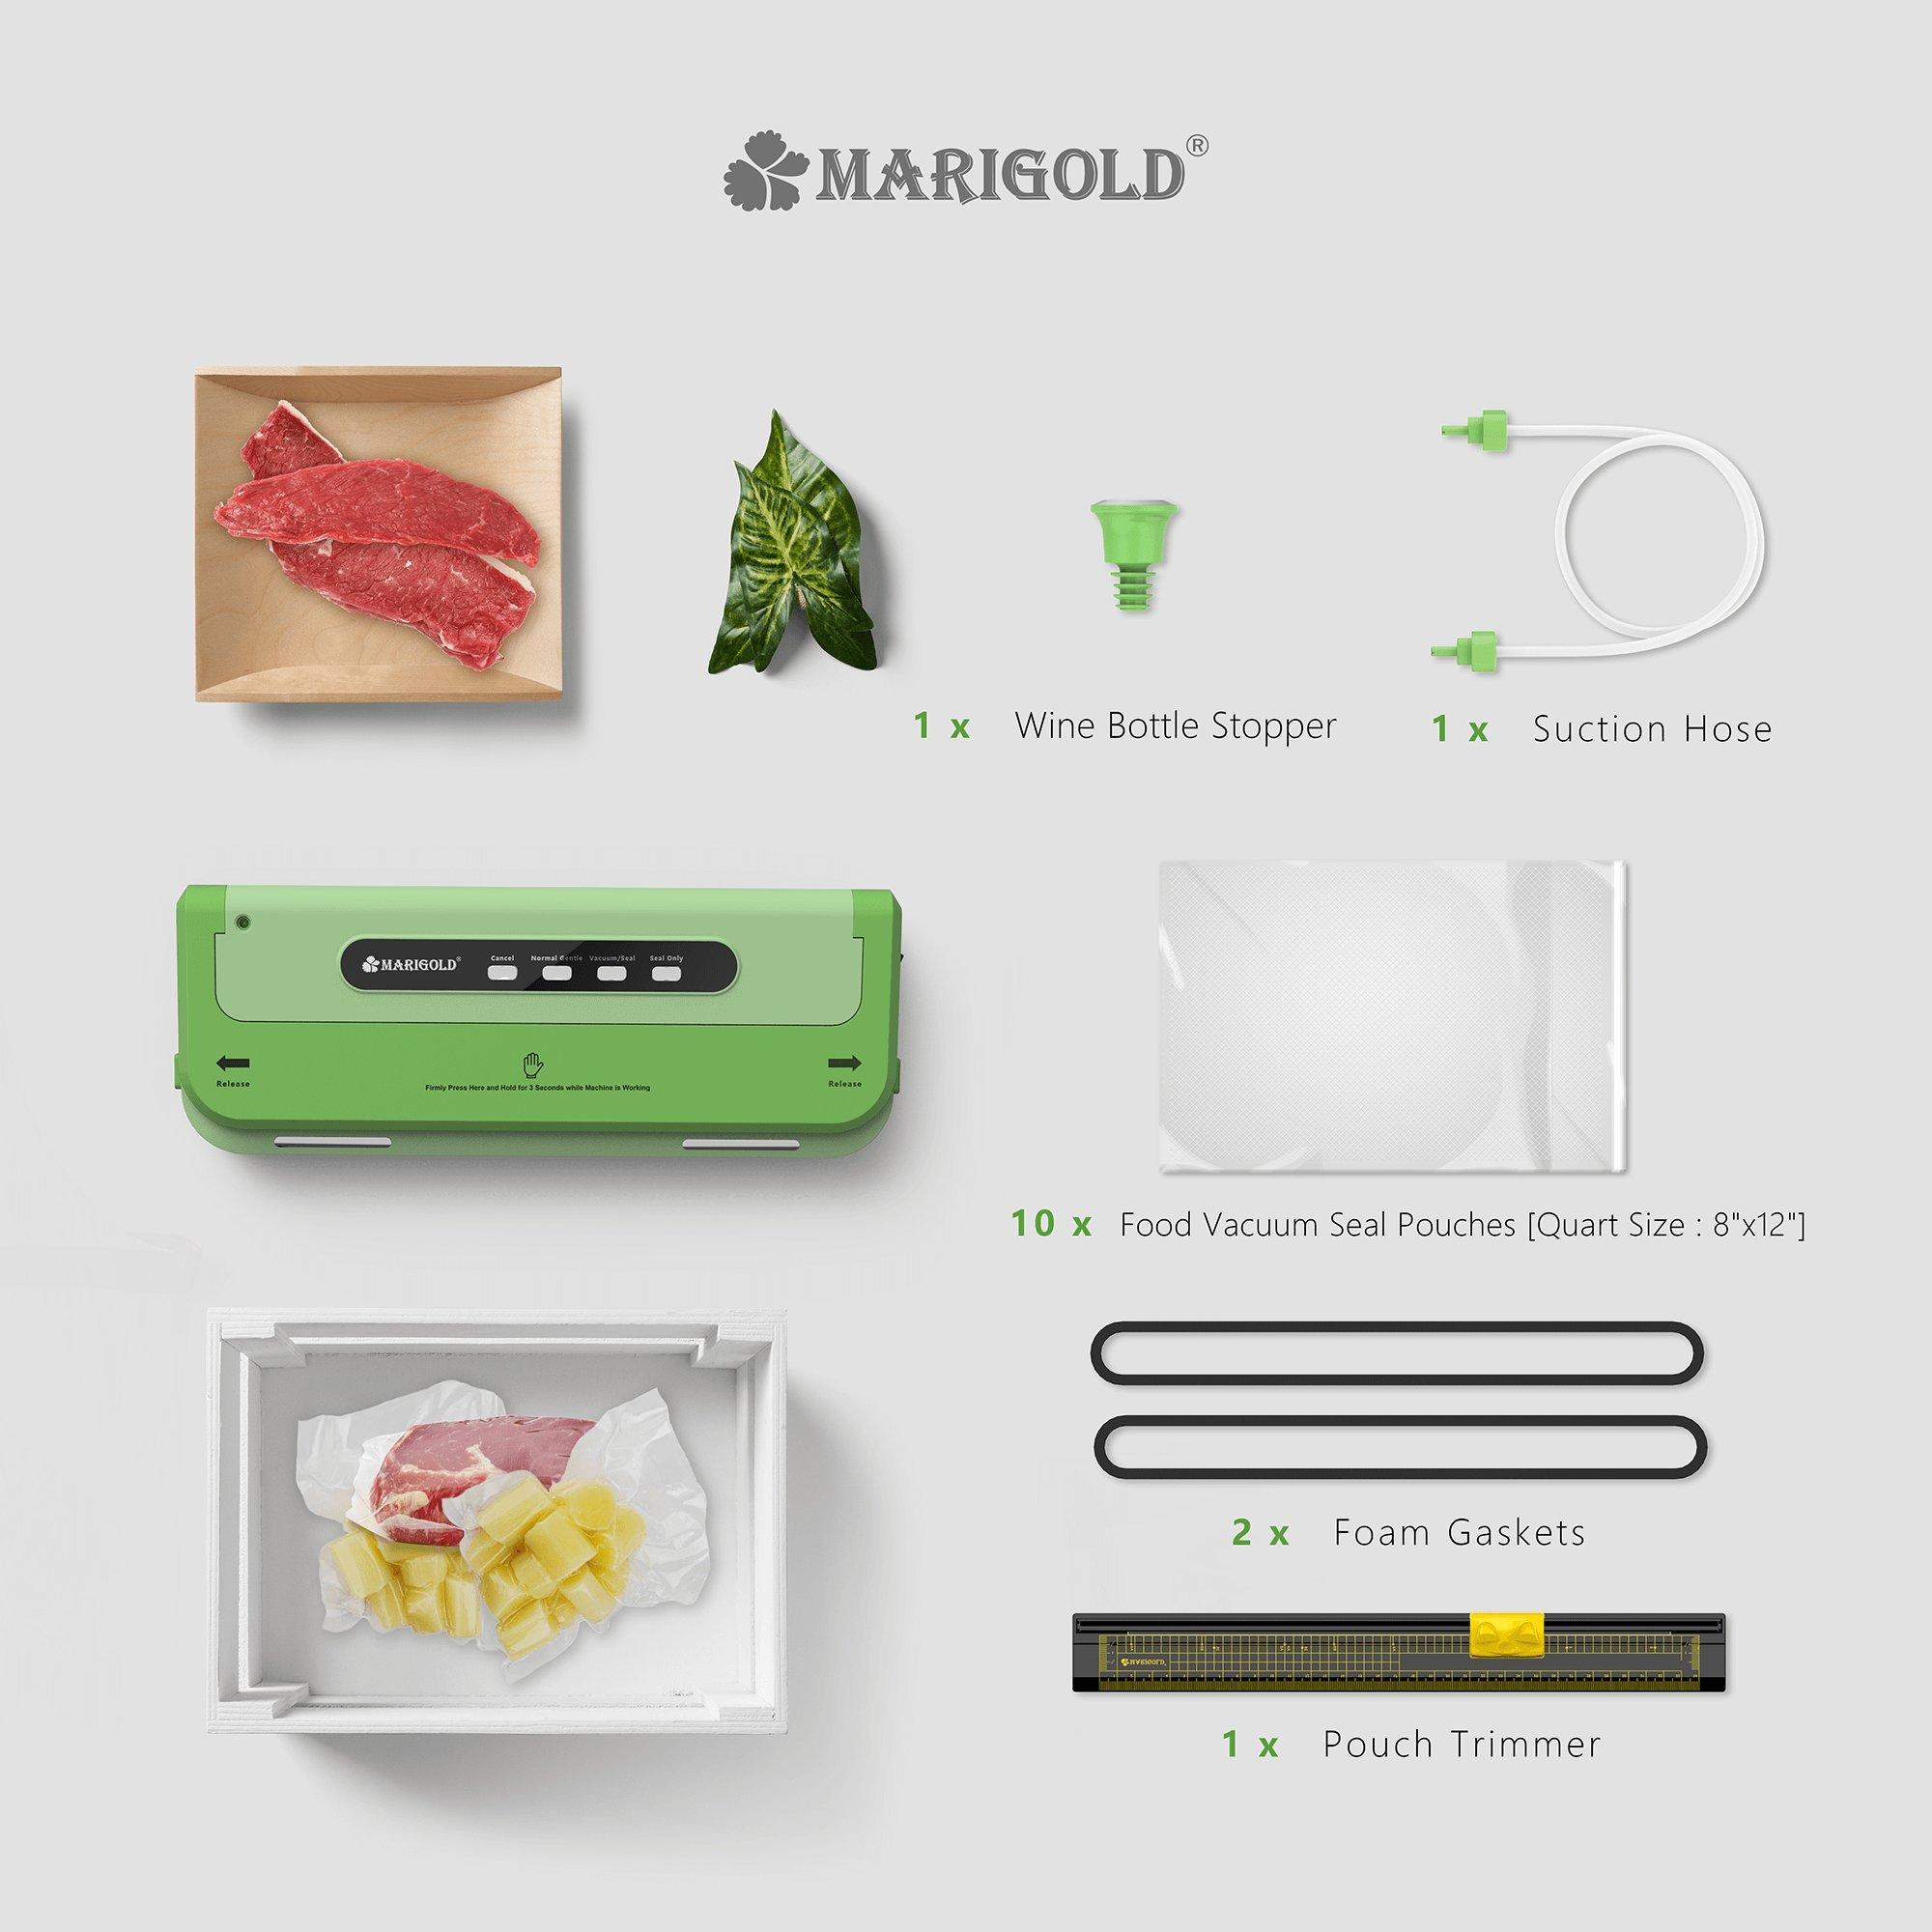 MARIGOLD Food Vacuum Sealer Machine w/Starter Kit (FVS1701) by MARIGOLD (Image #2)